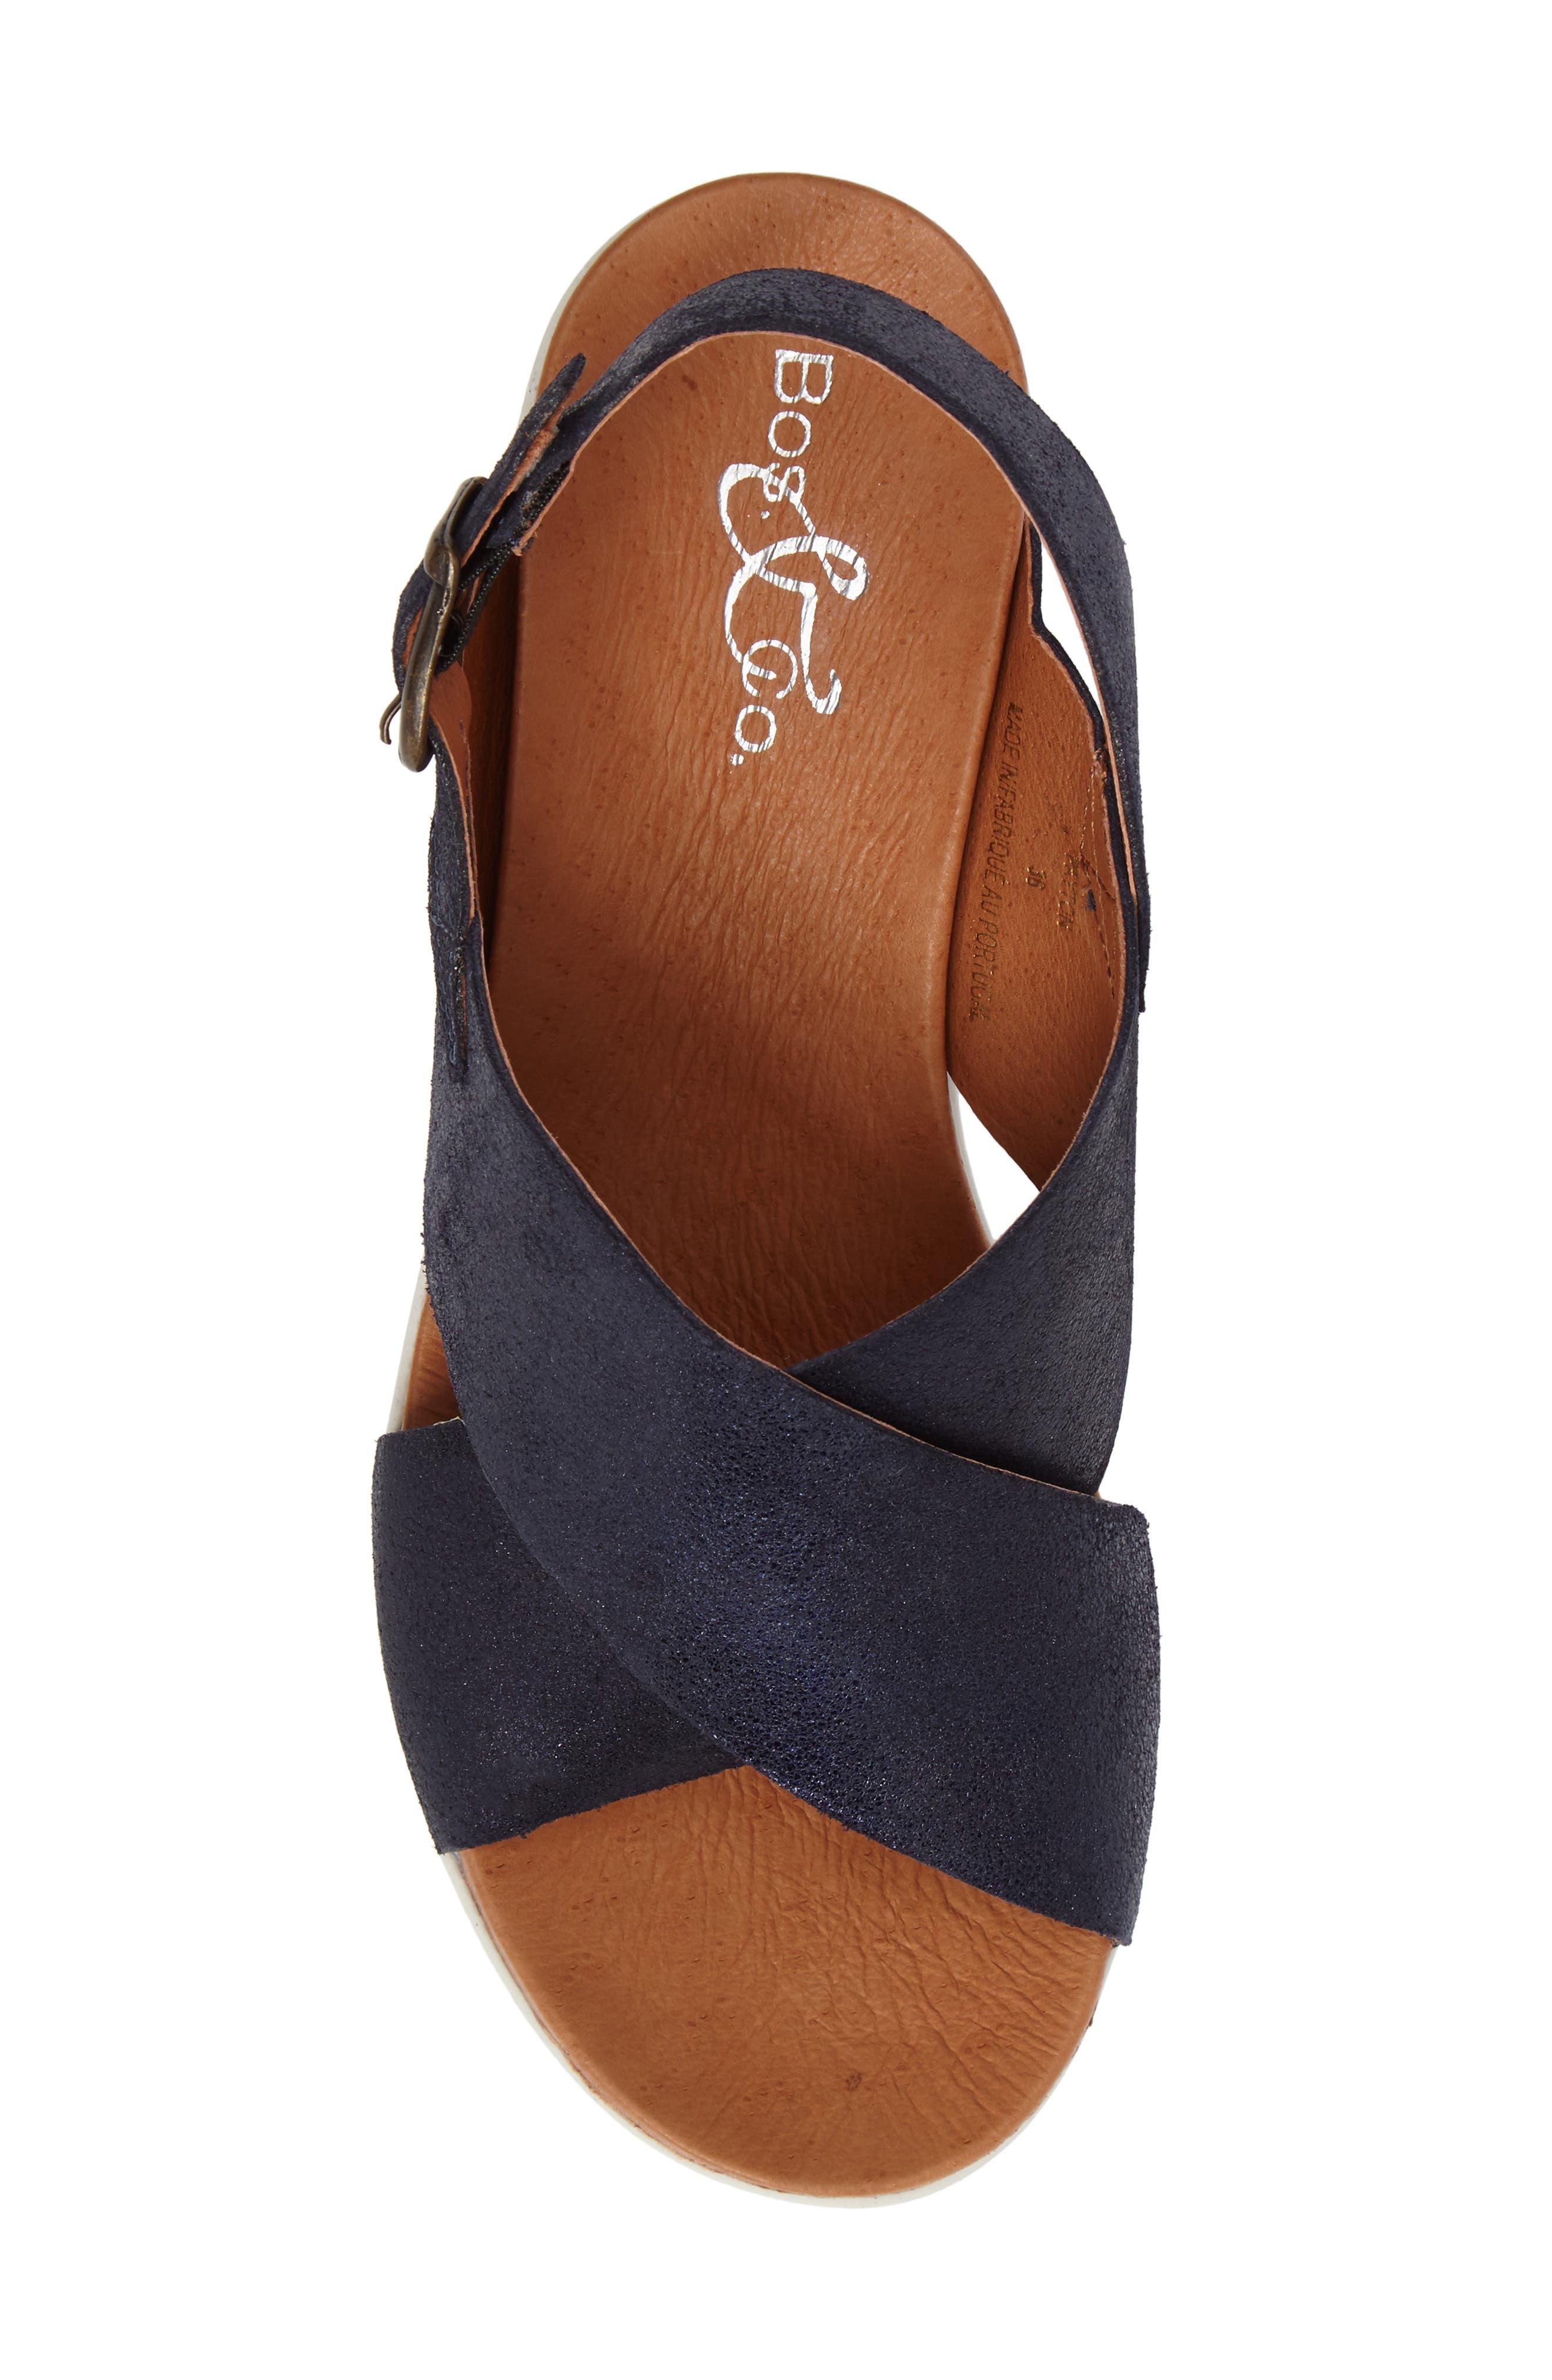 Payton Platform Wedge Sandal,                             Alternate thumbnail 5, color,                             Navy Glitter Suede